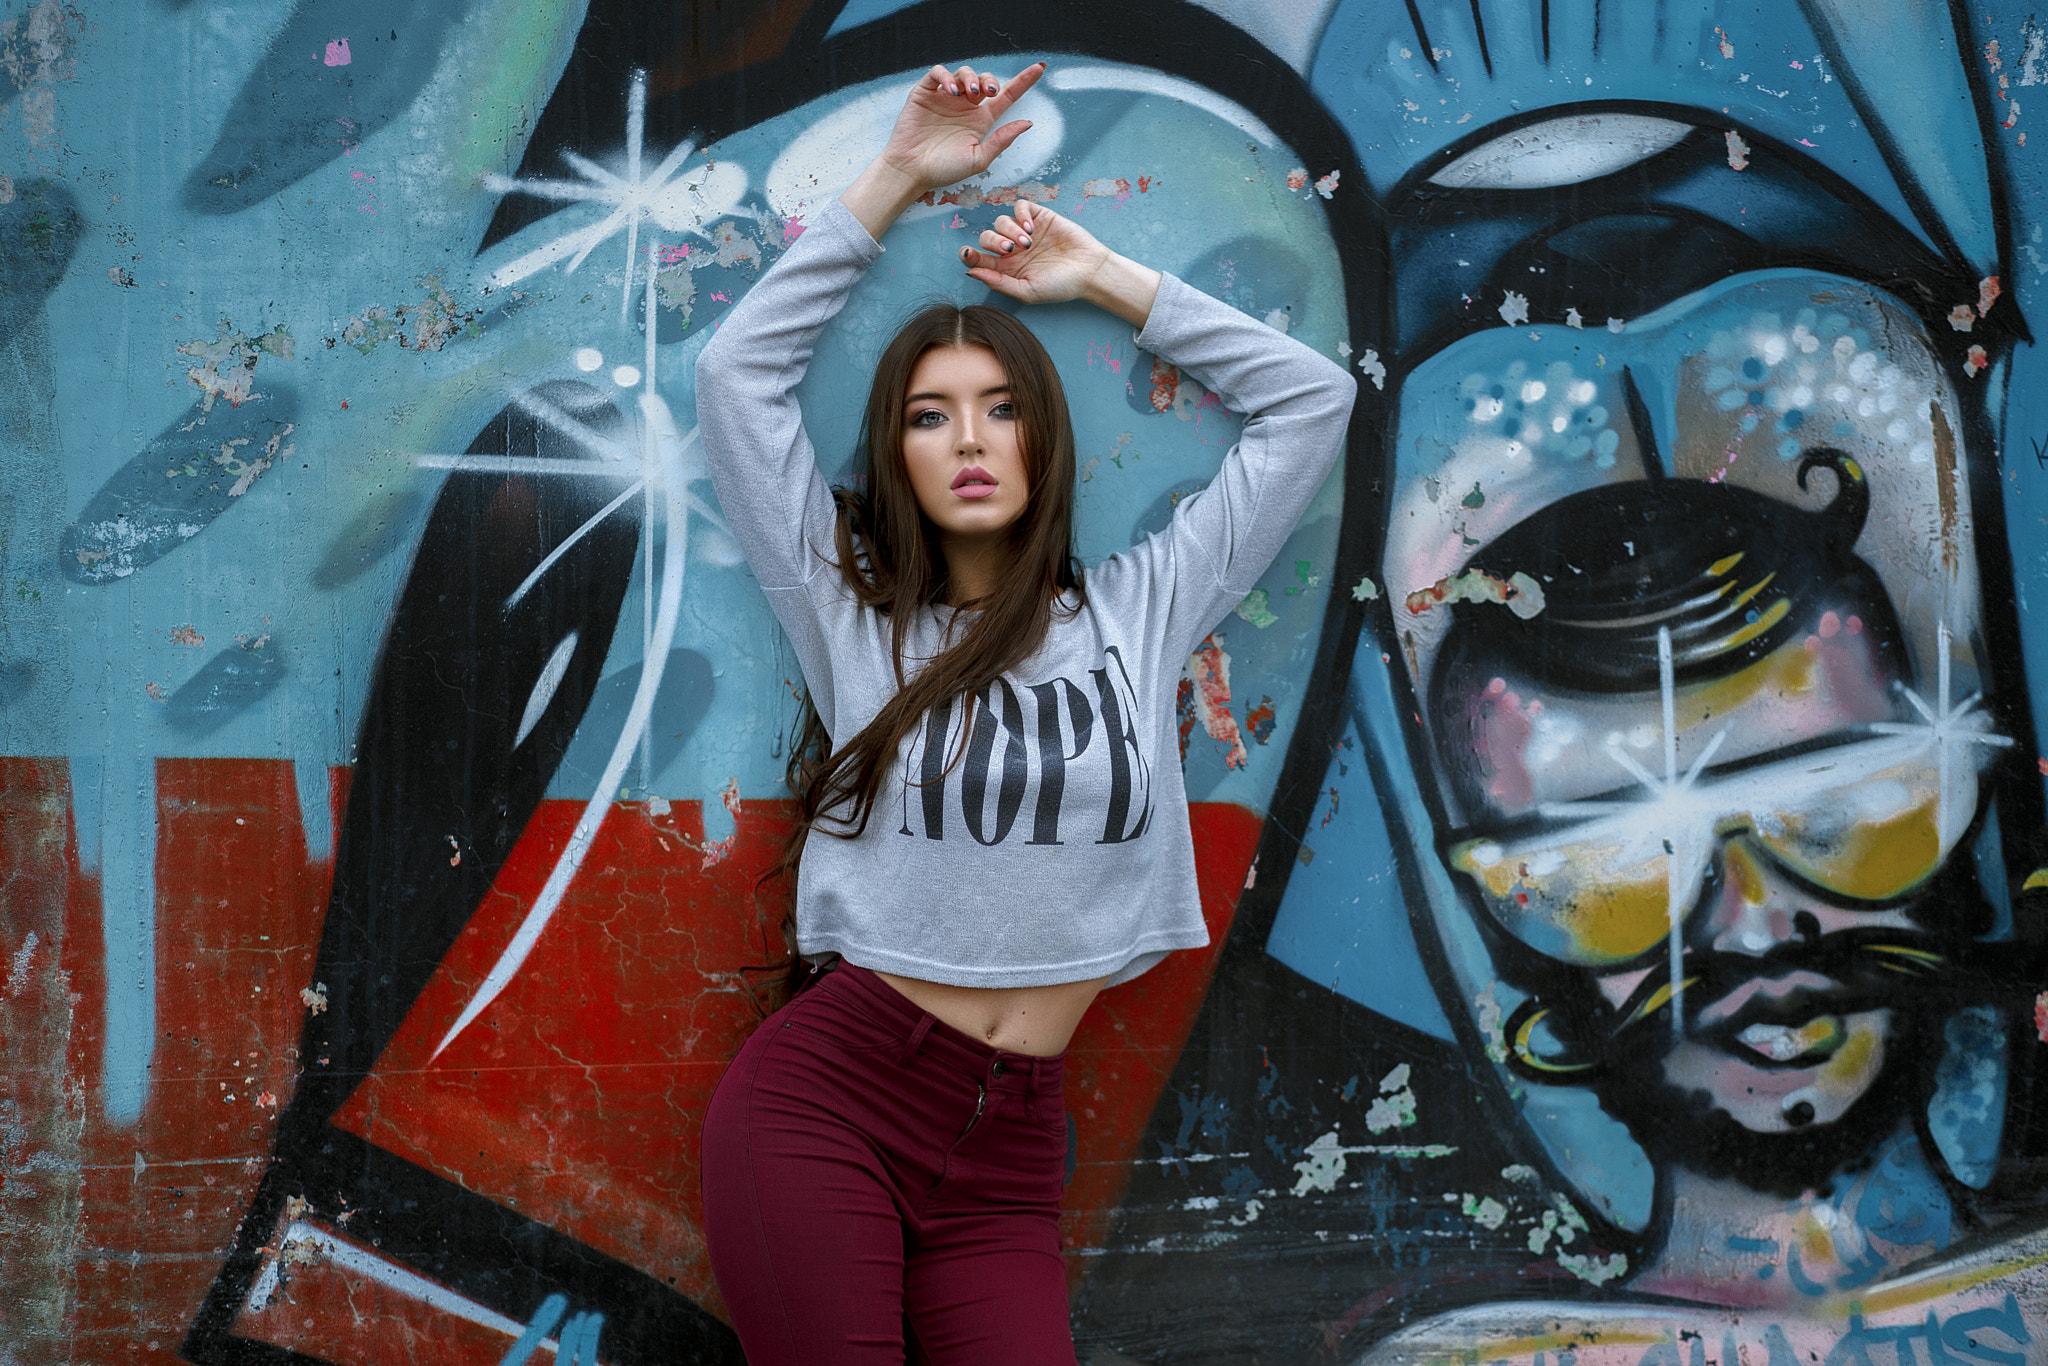 People 2048x1366 women graffiti belly arms up wall pants portrait